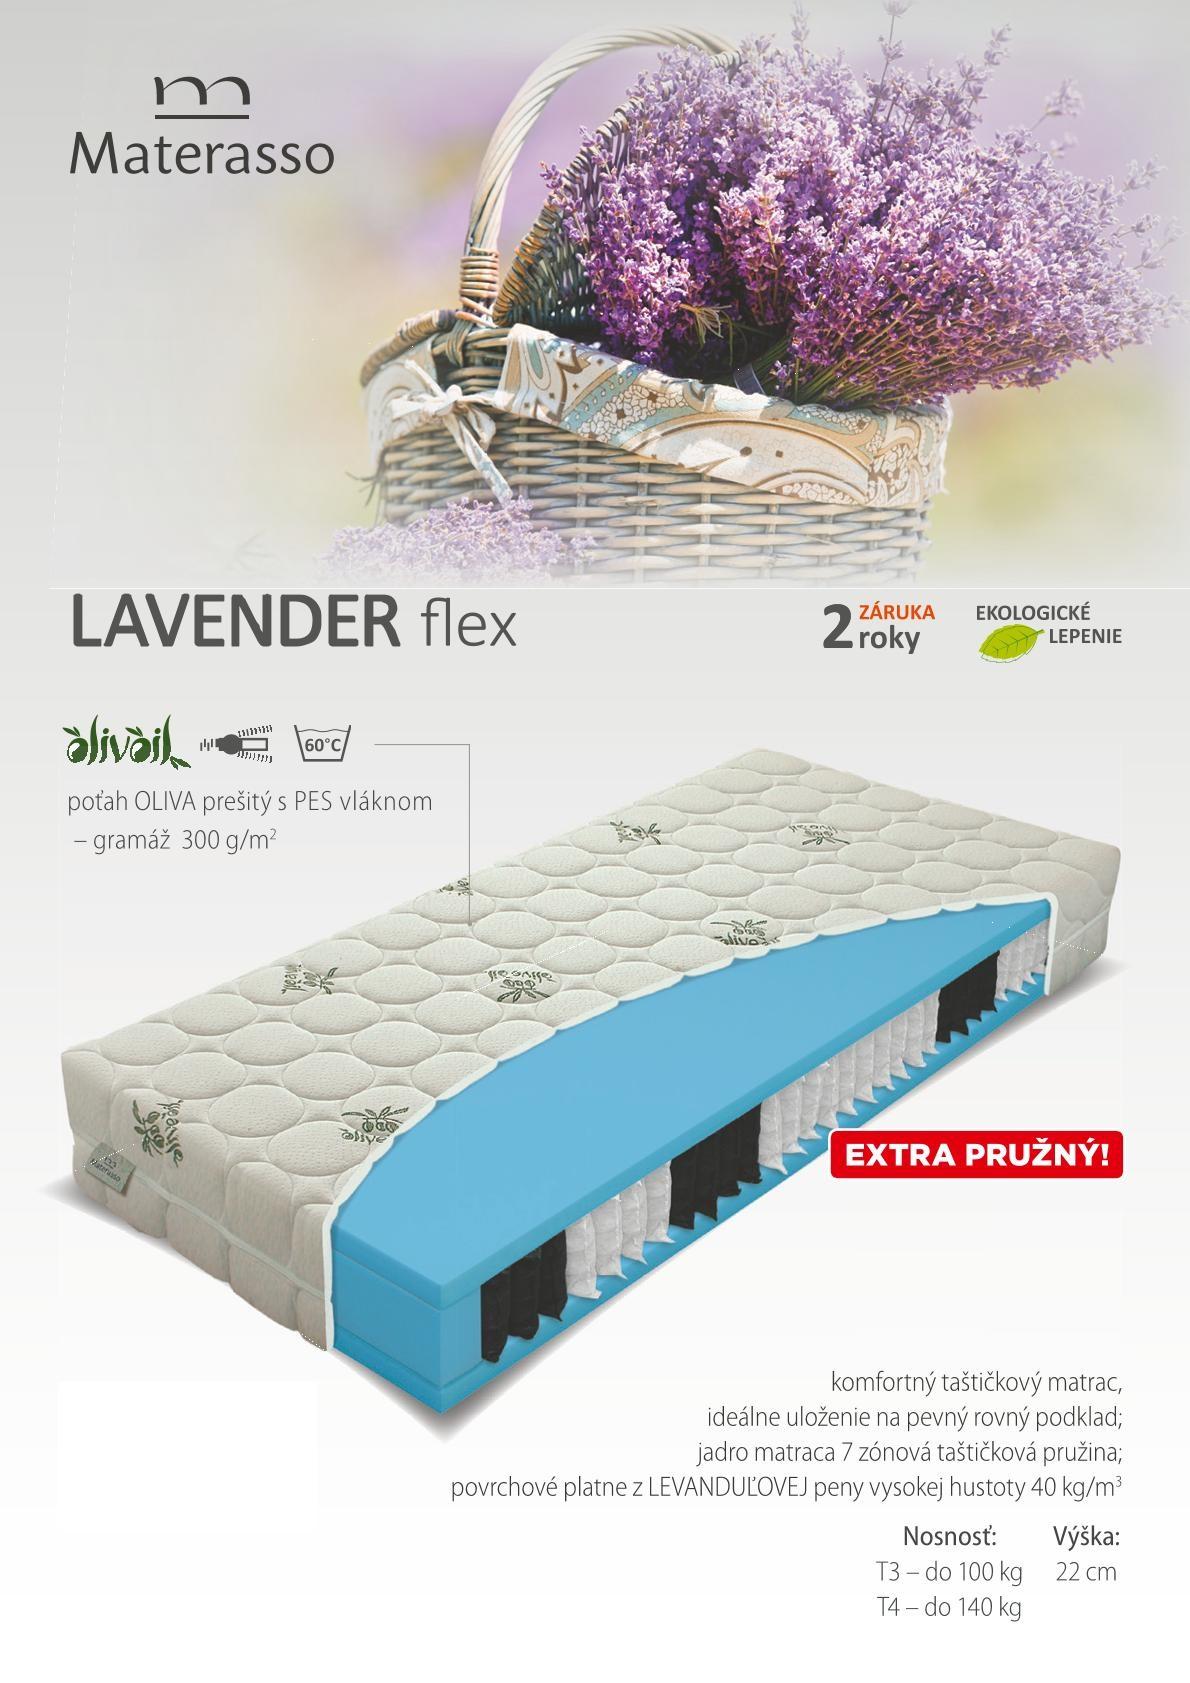 Lavender flex